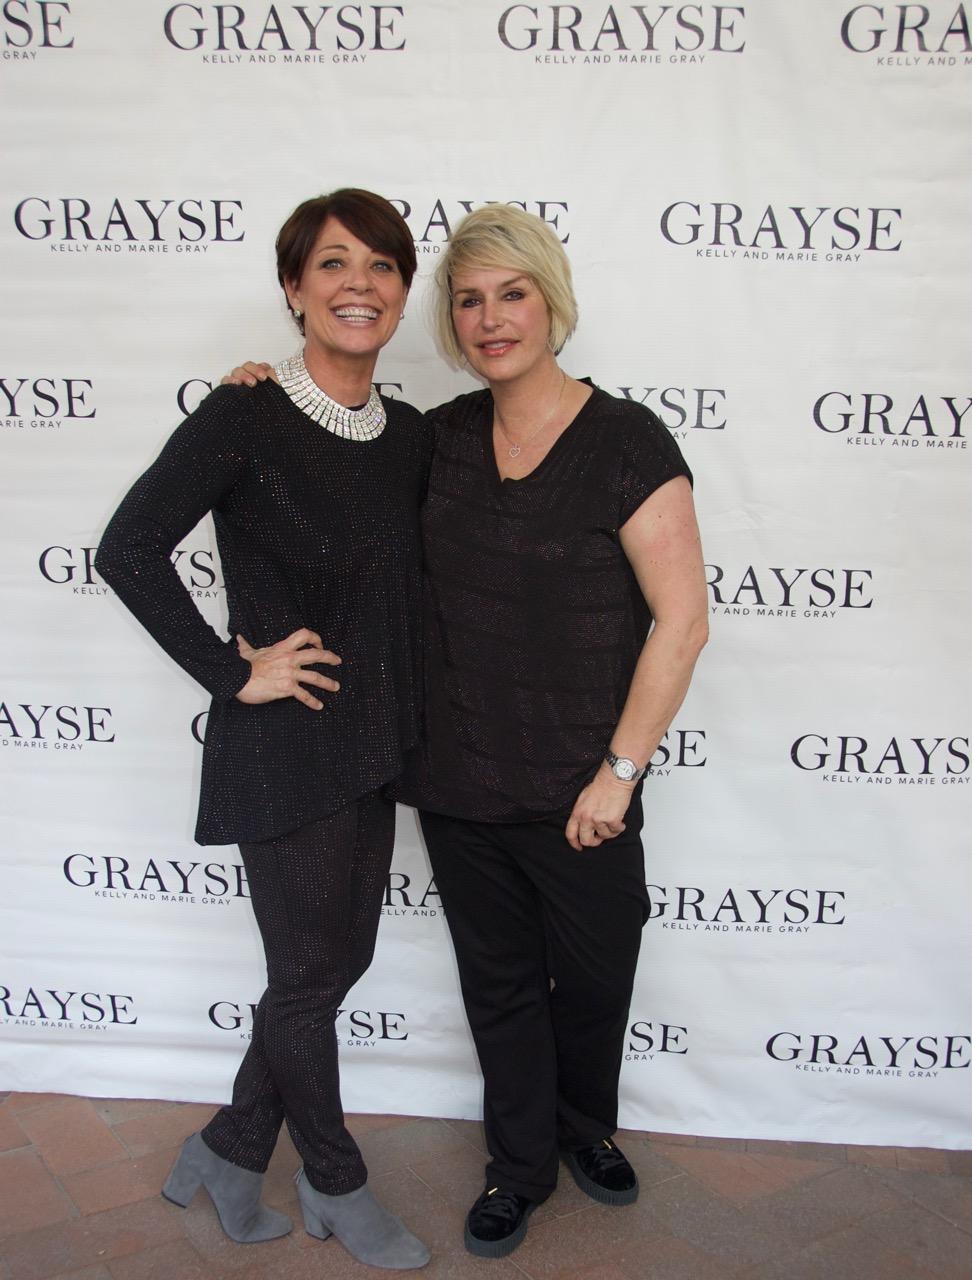 Christine Peake & Kelly Gray